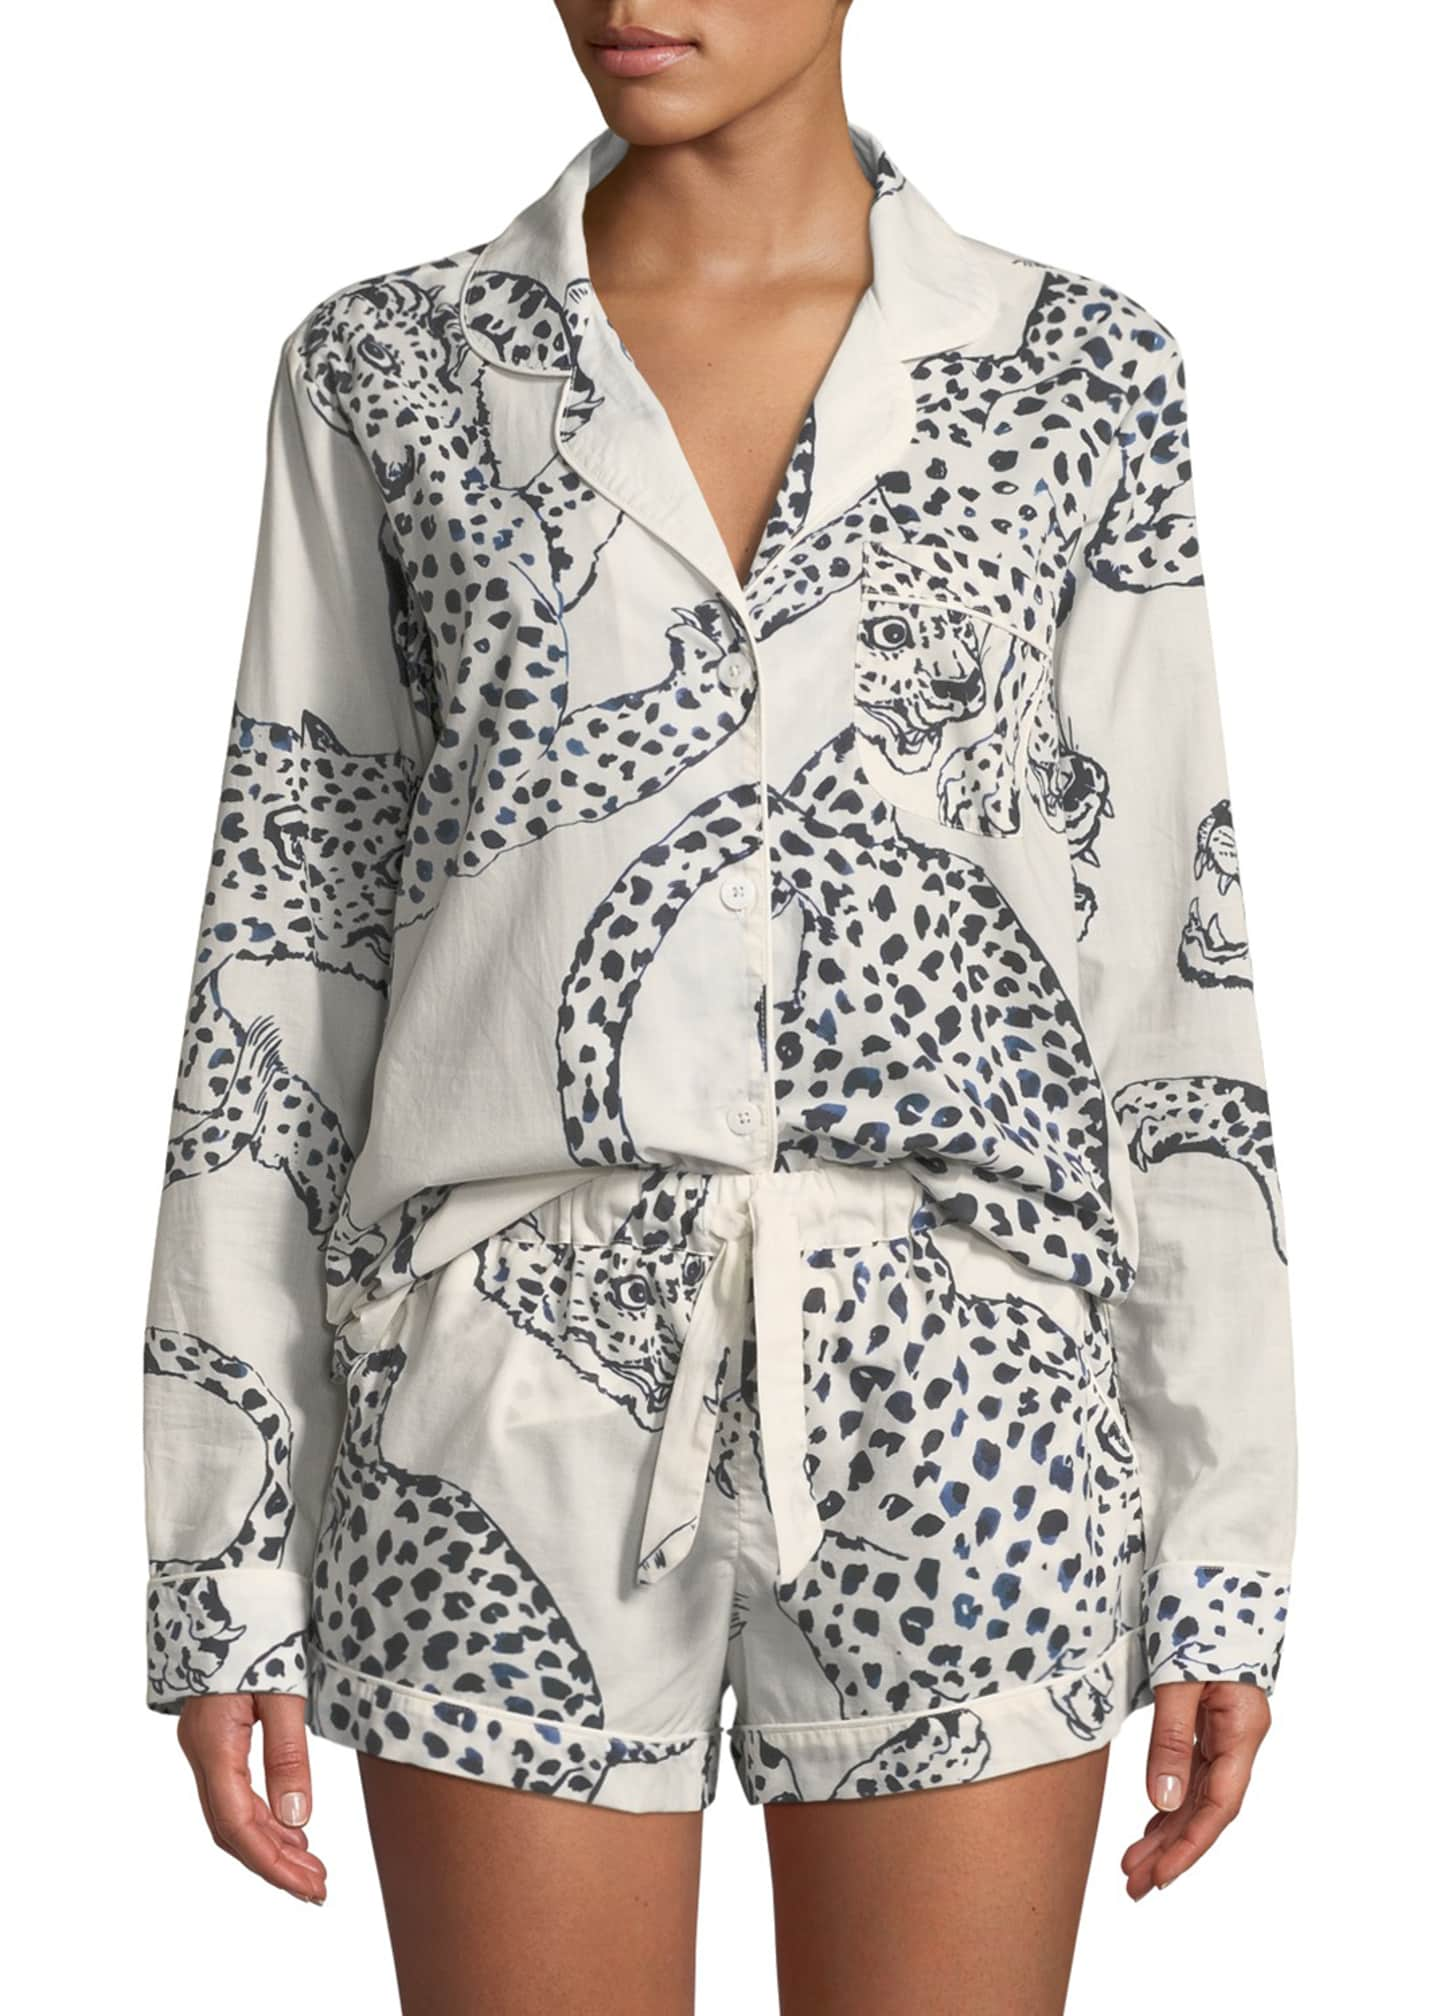 Desmond & Dempsey Leopard Print Classic Short Pajama